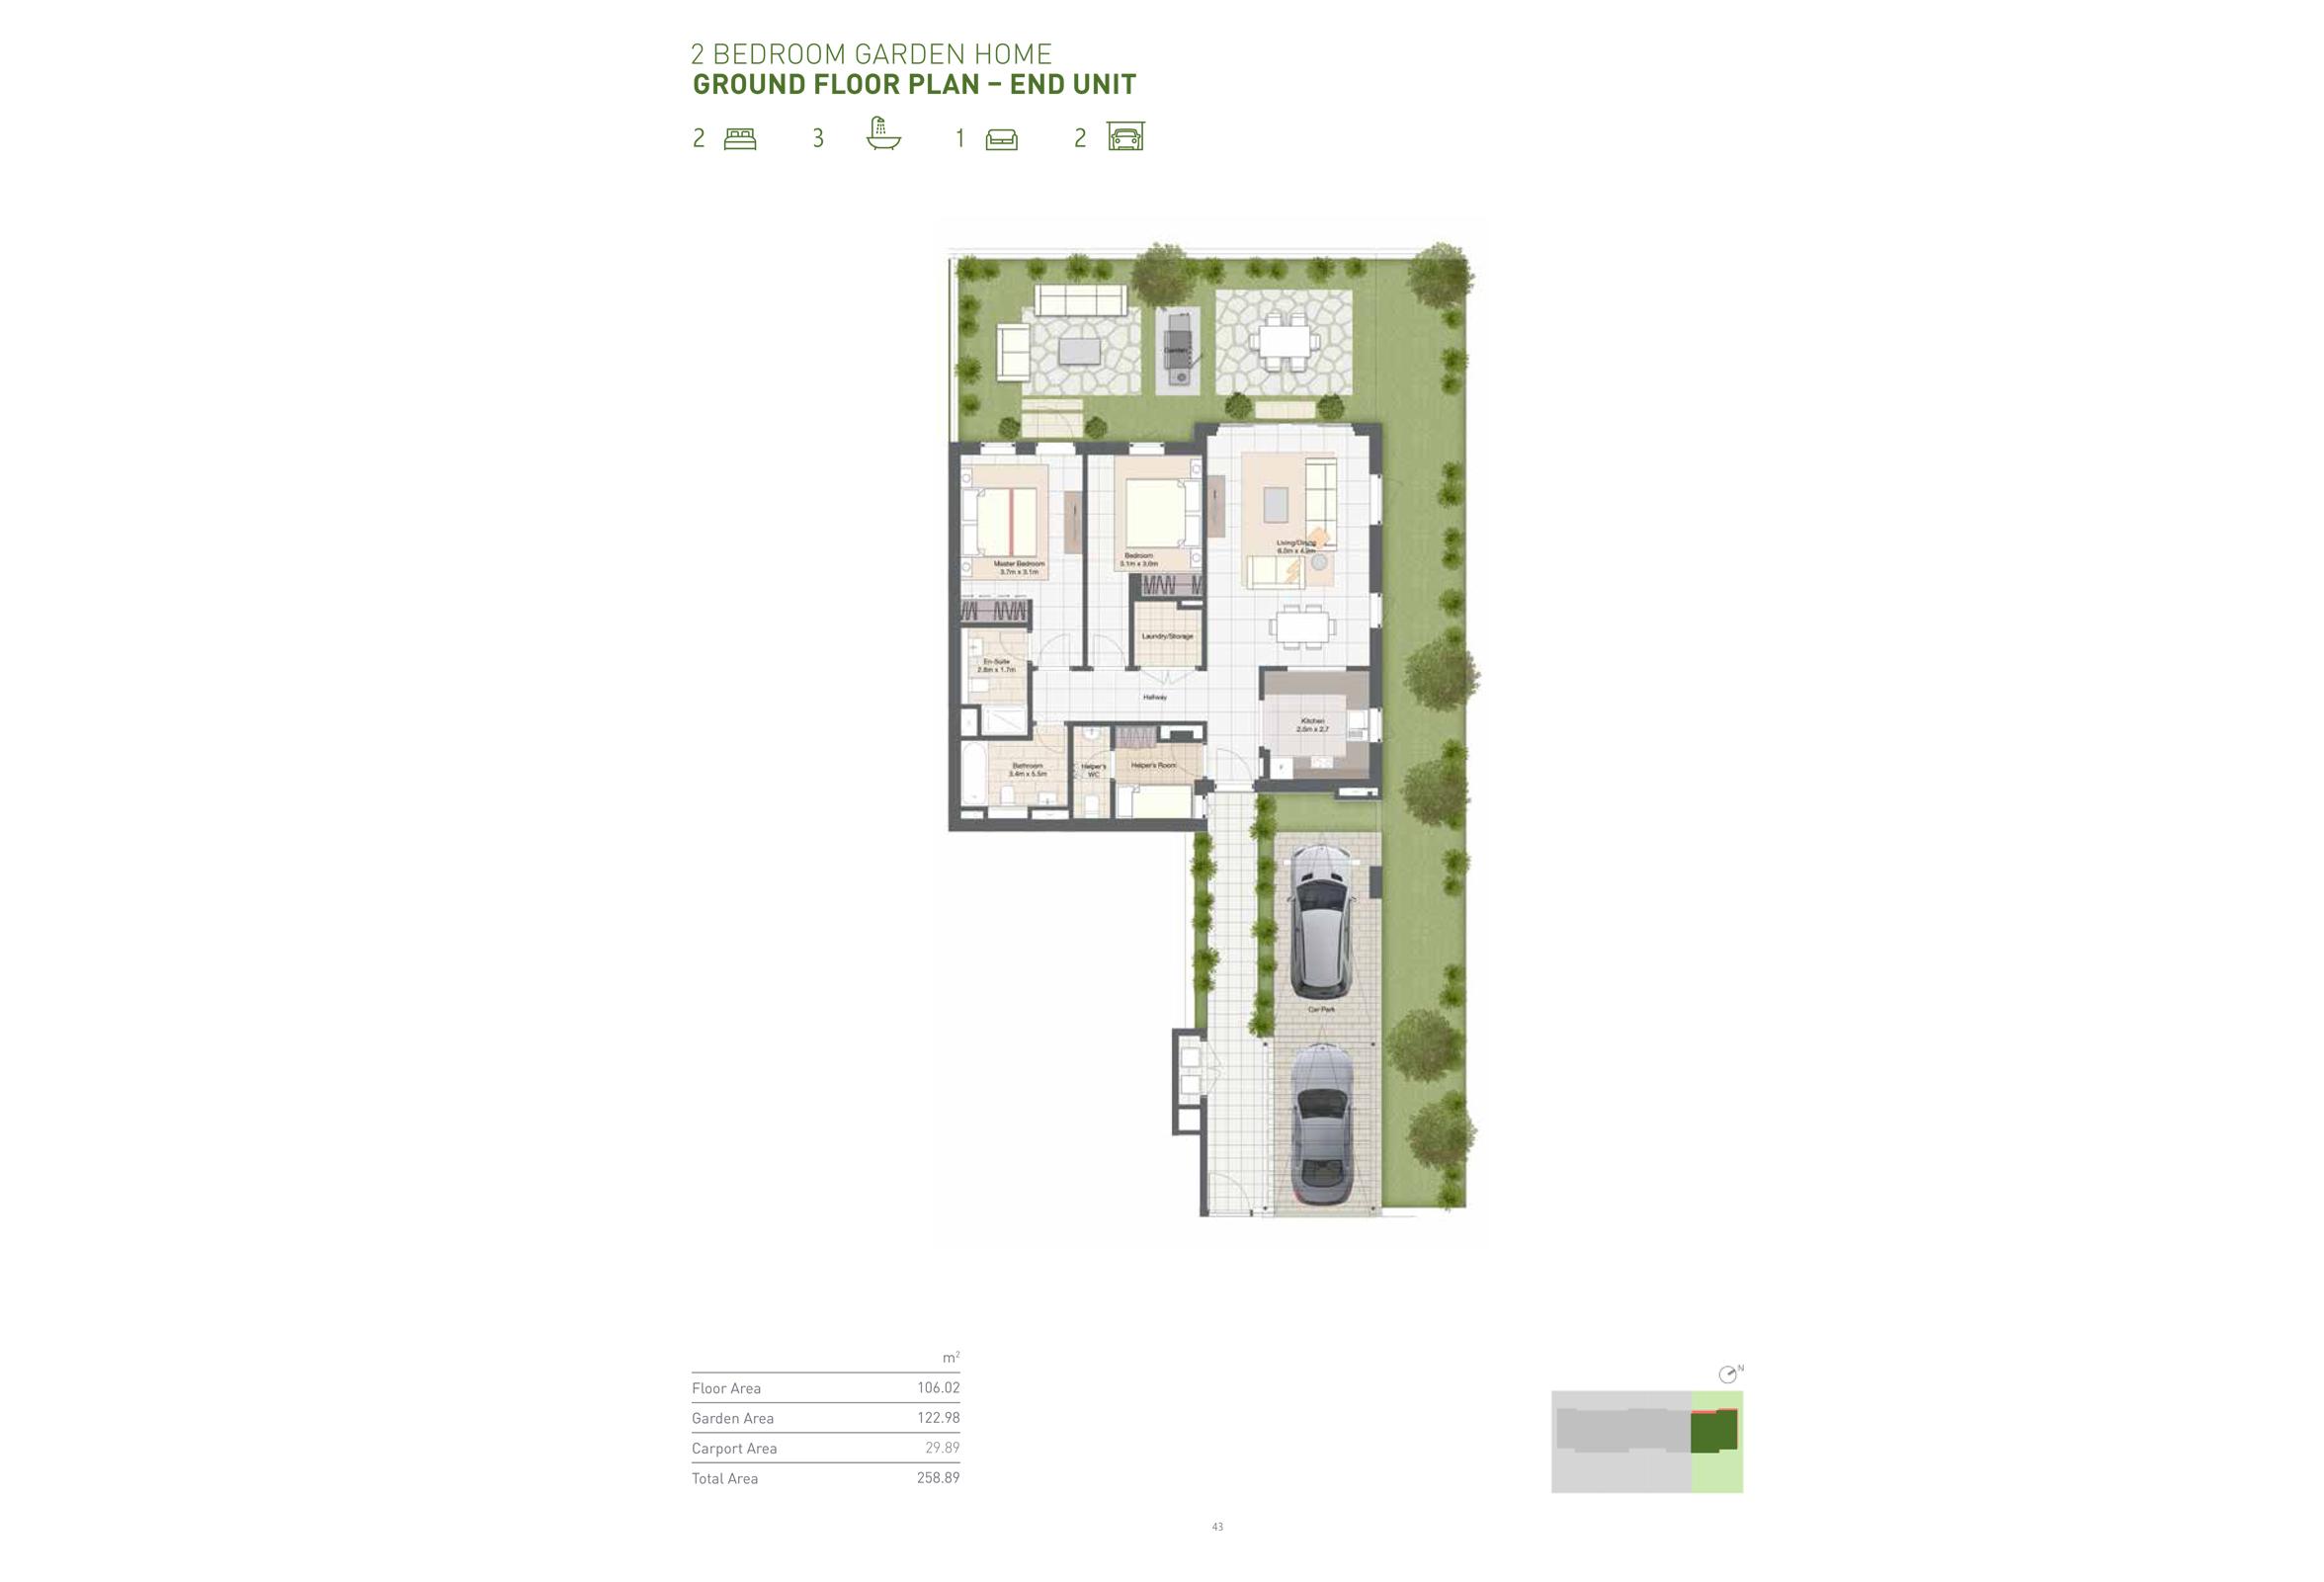 2 Bedroom Garden Home - Ground Floor - End Unit Size 258 Sqm